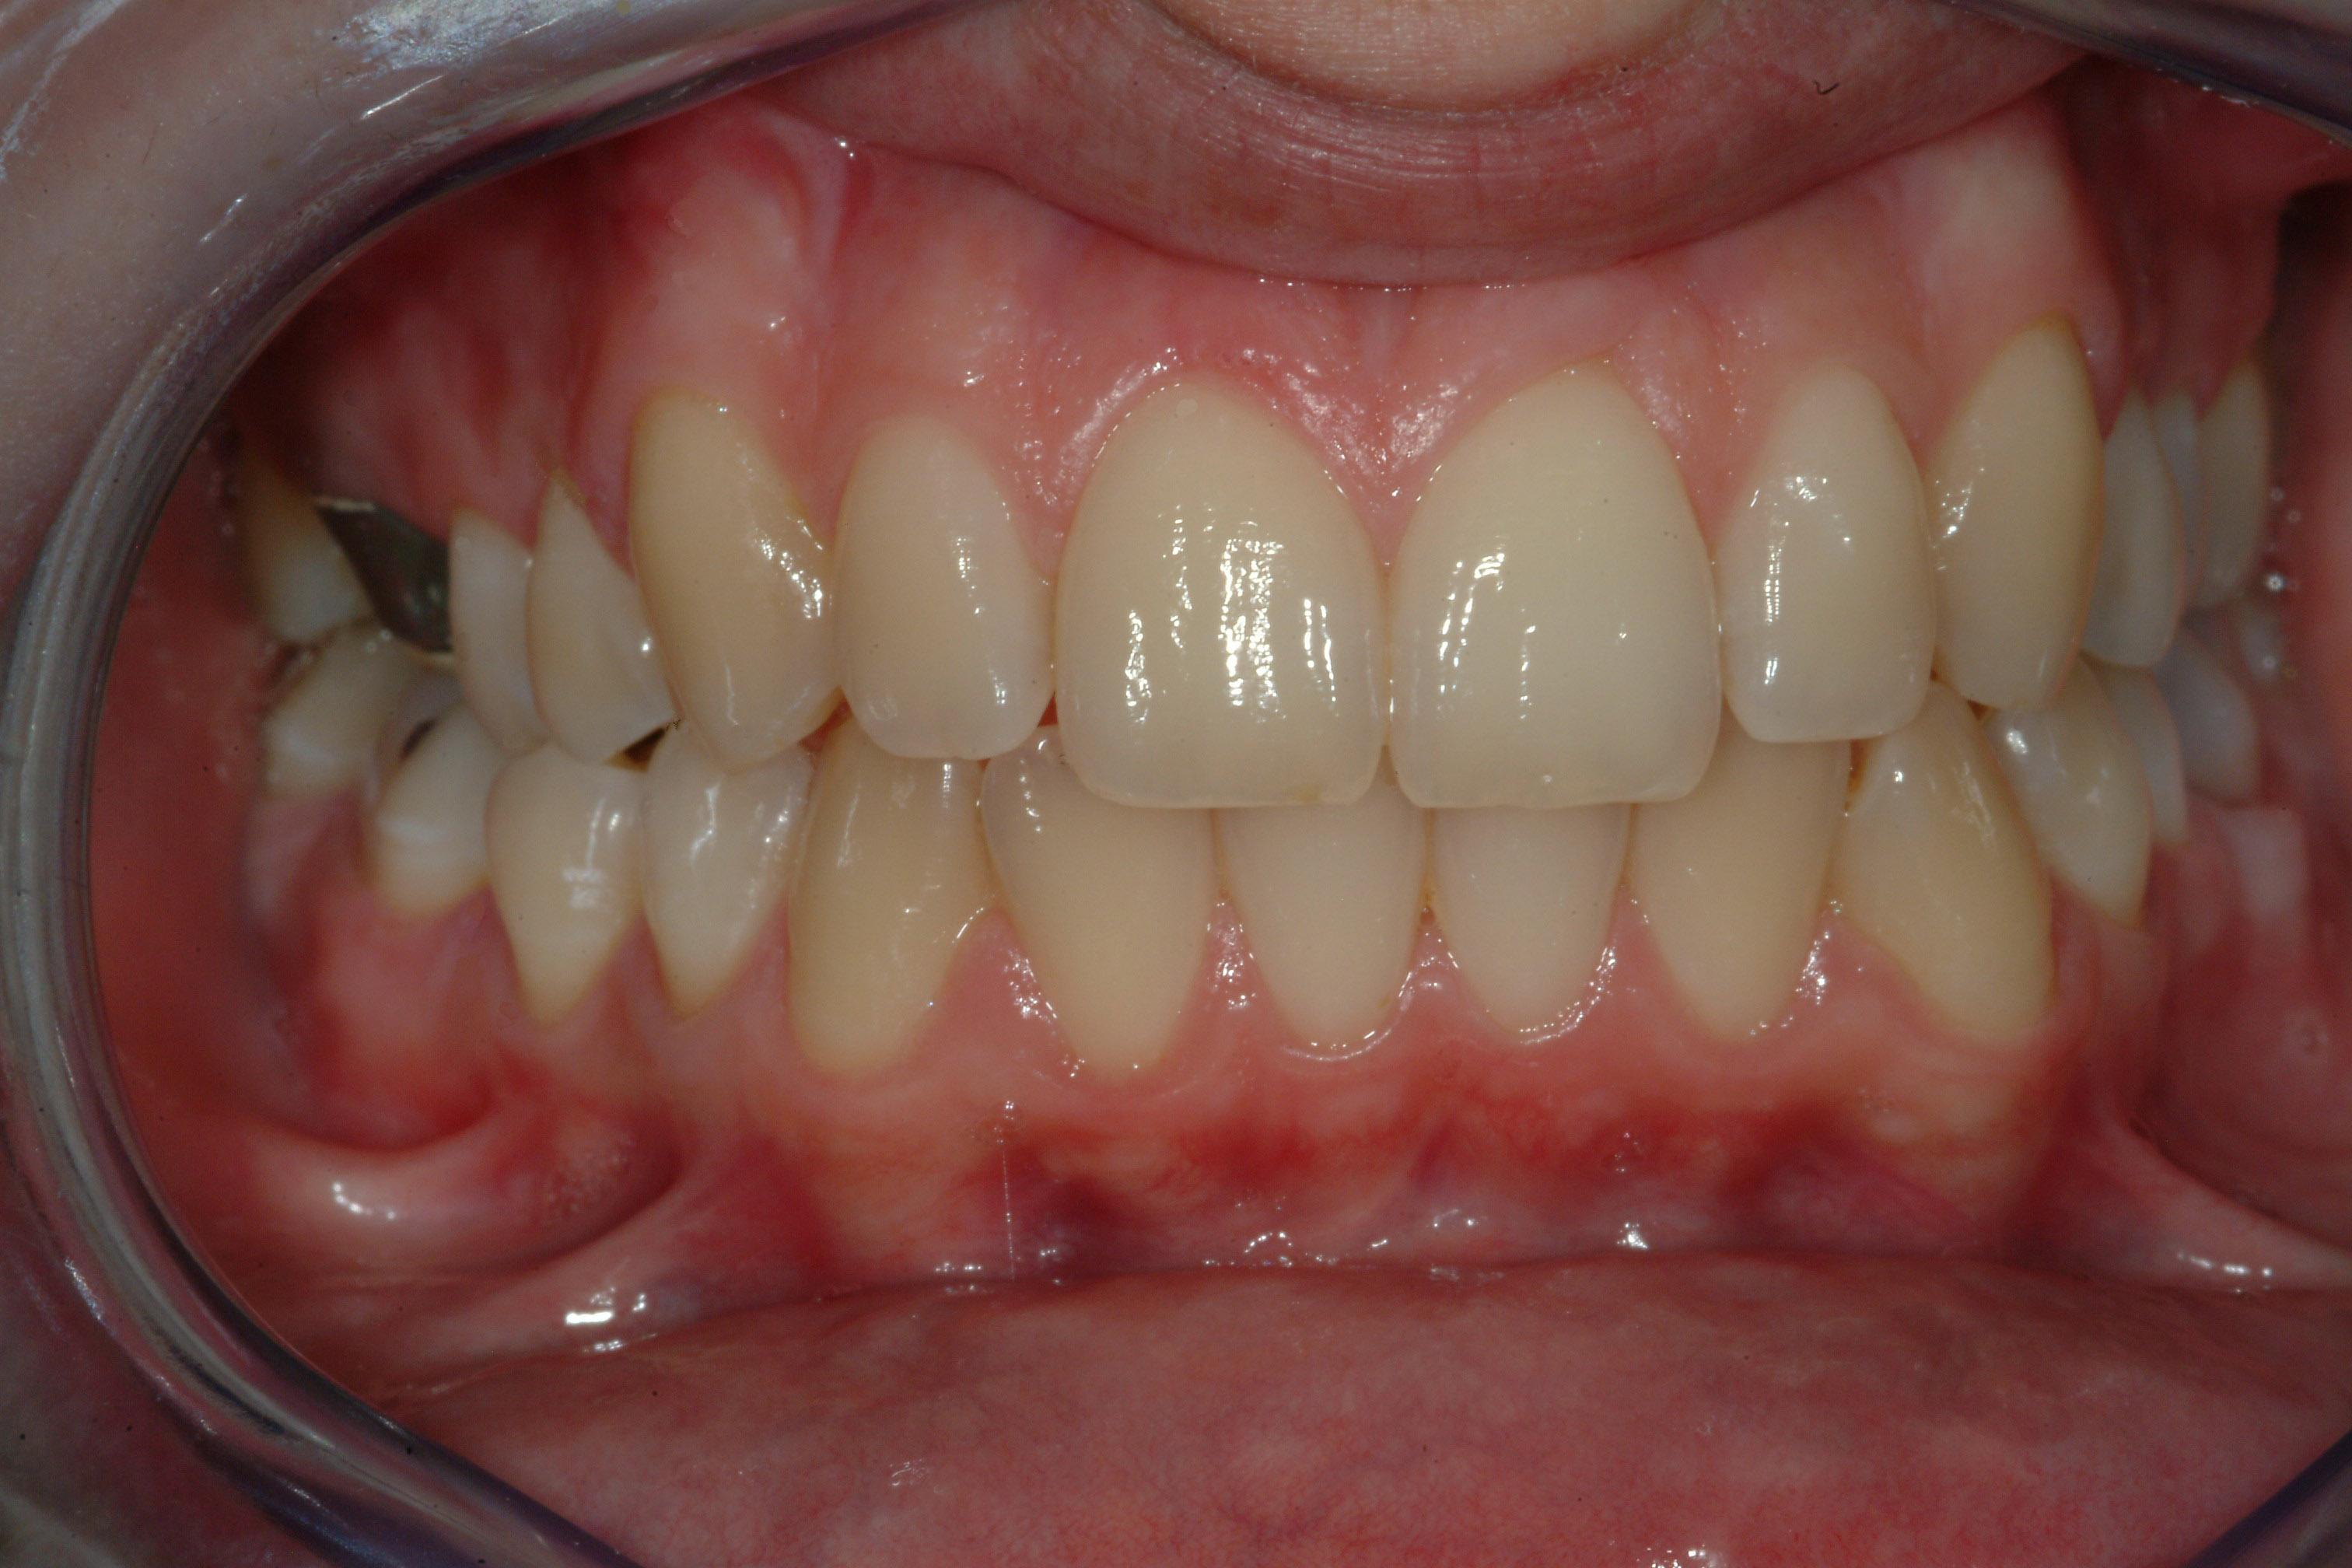 Sbiancamento dentale con laser